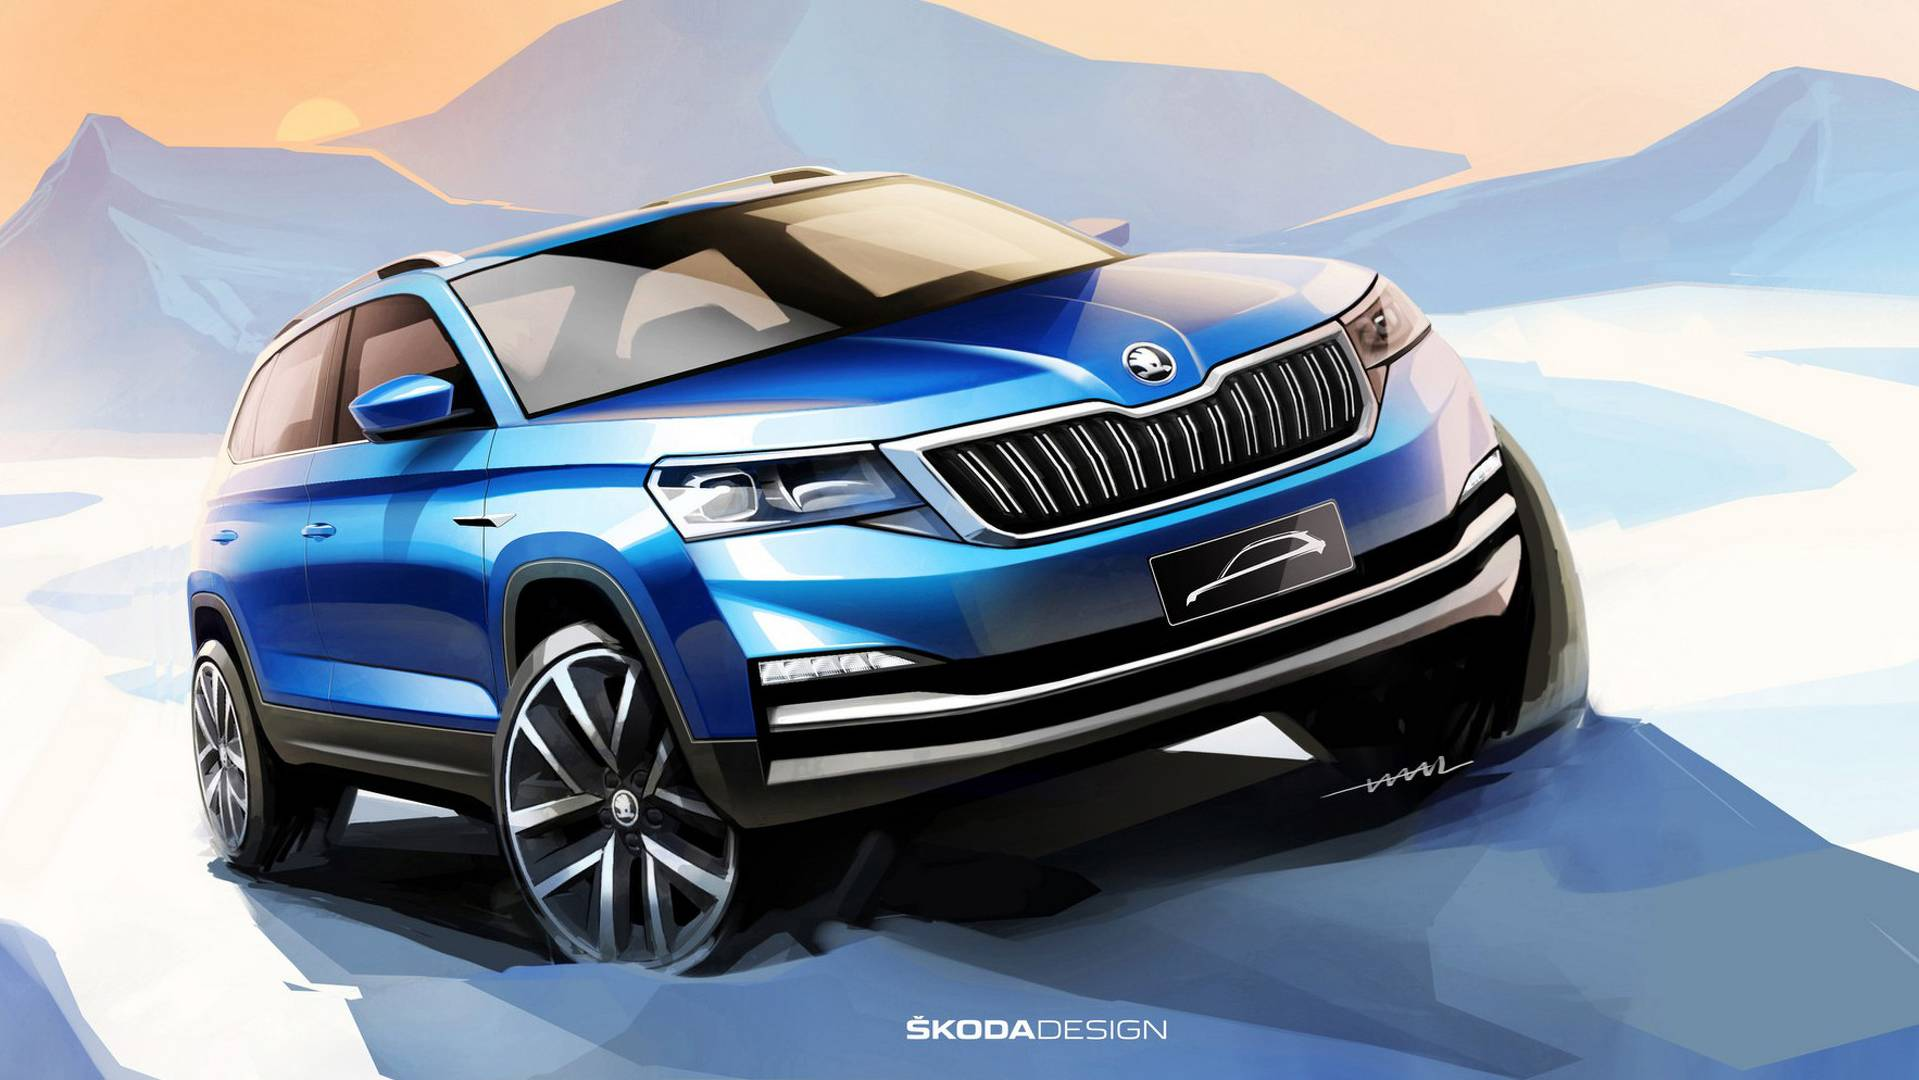 2018 Skoda Kamiq Teased In Official Design Sketches - autoevolution